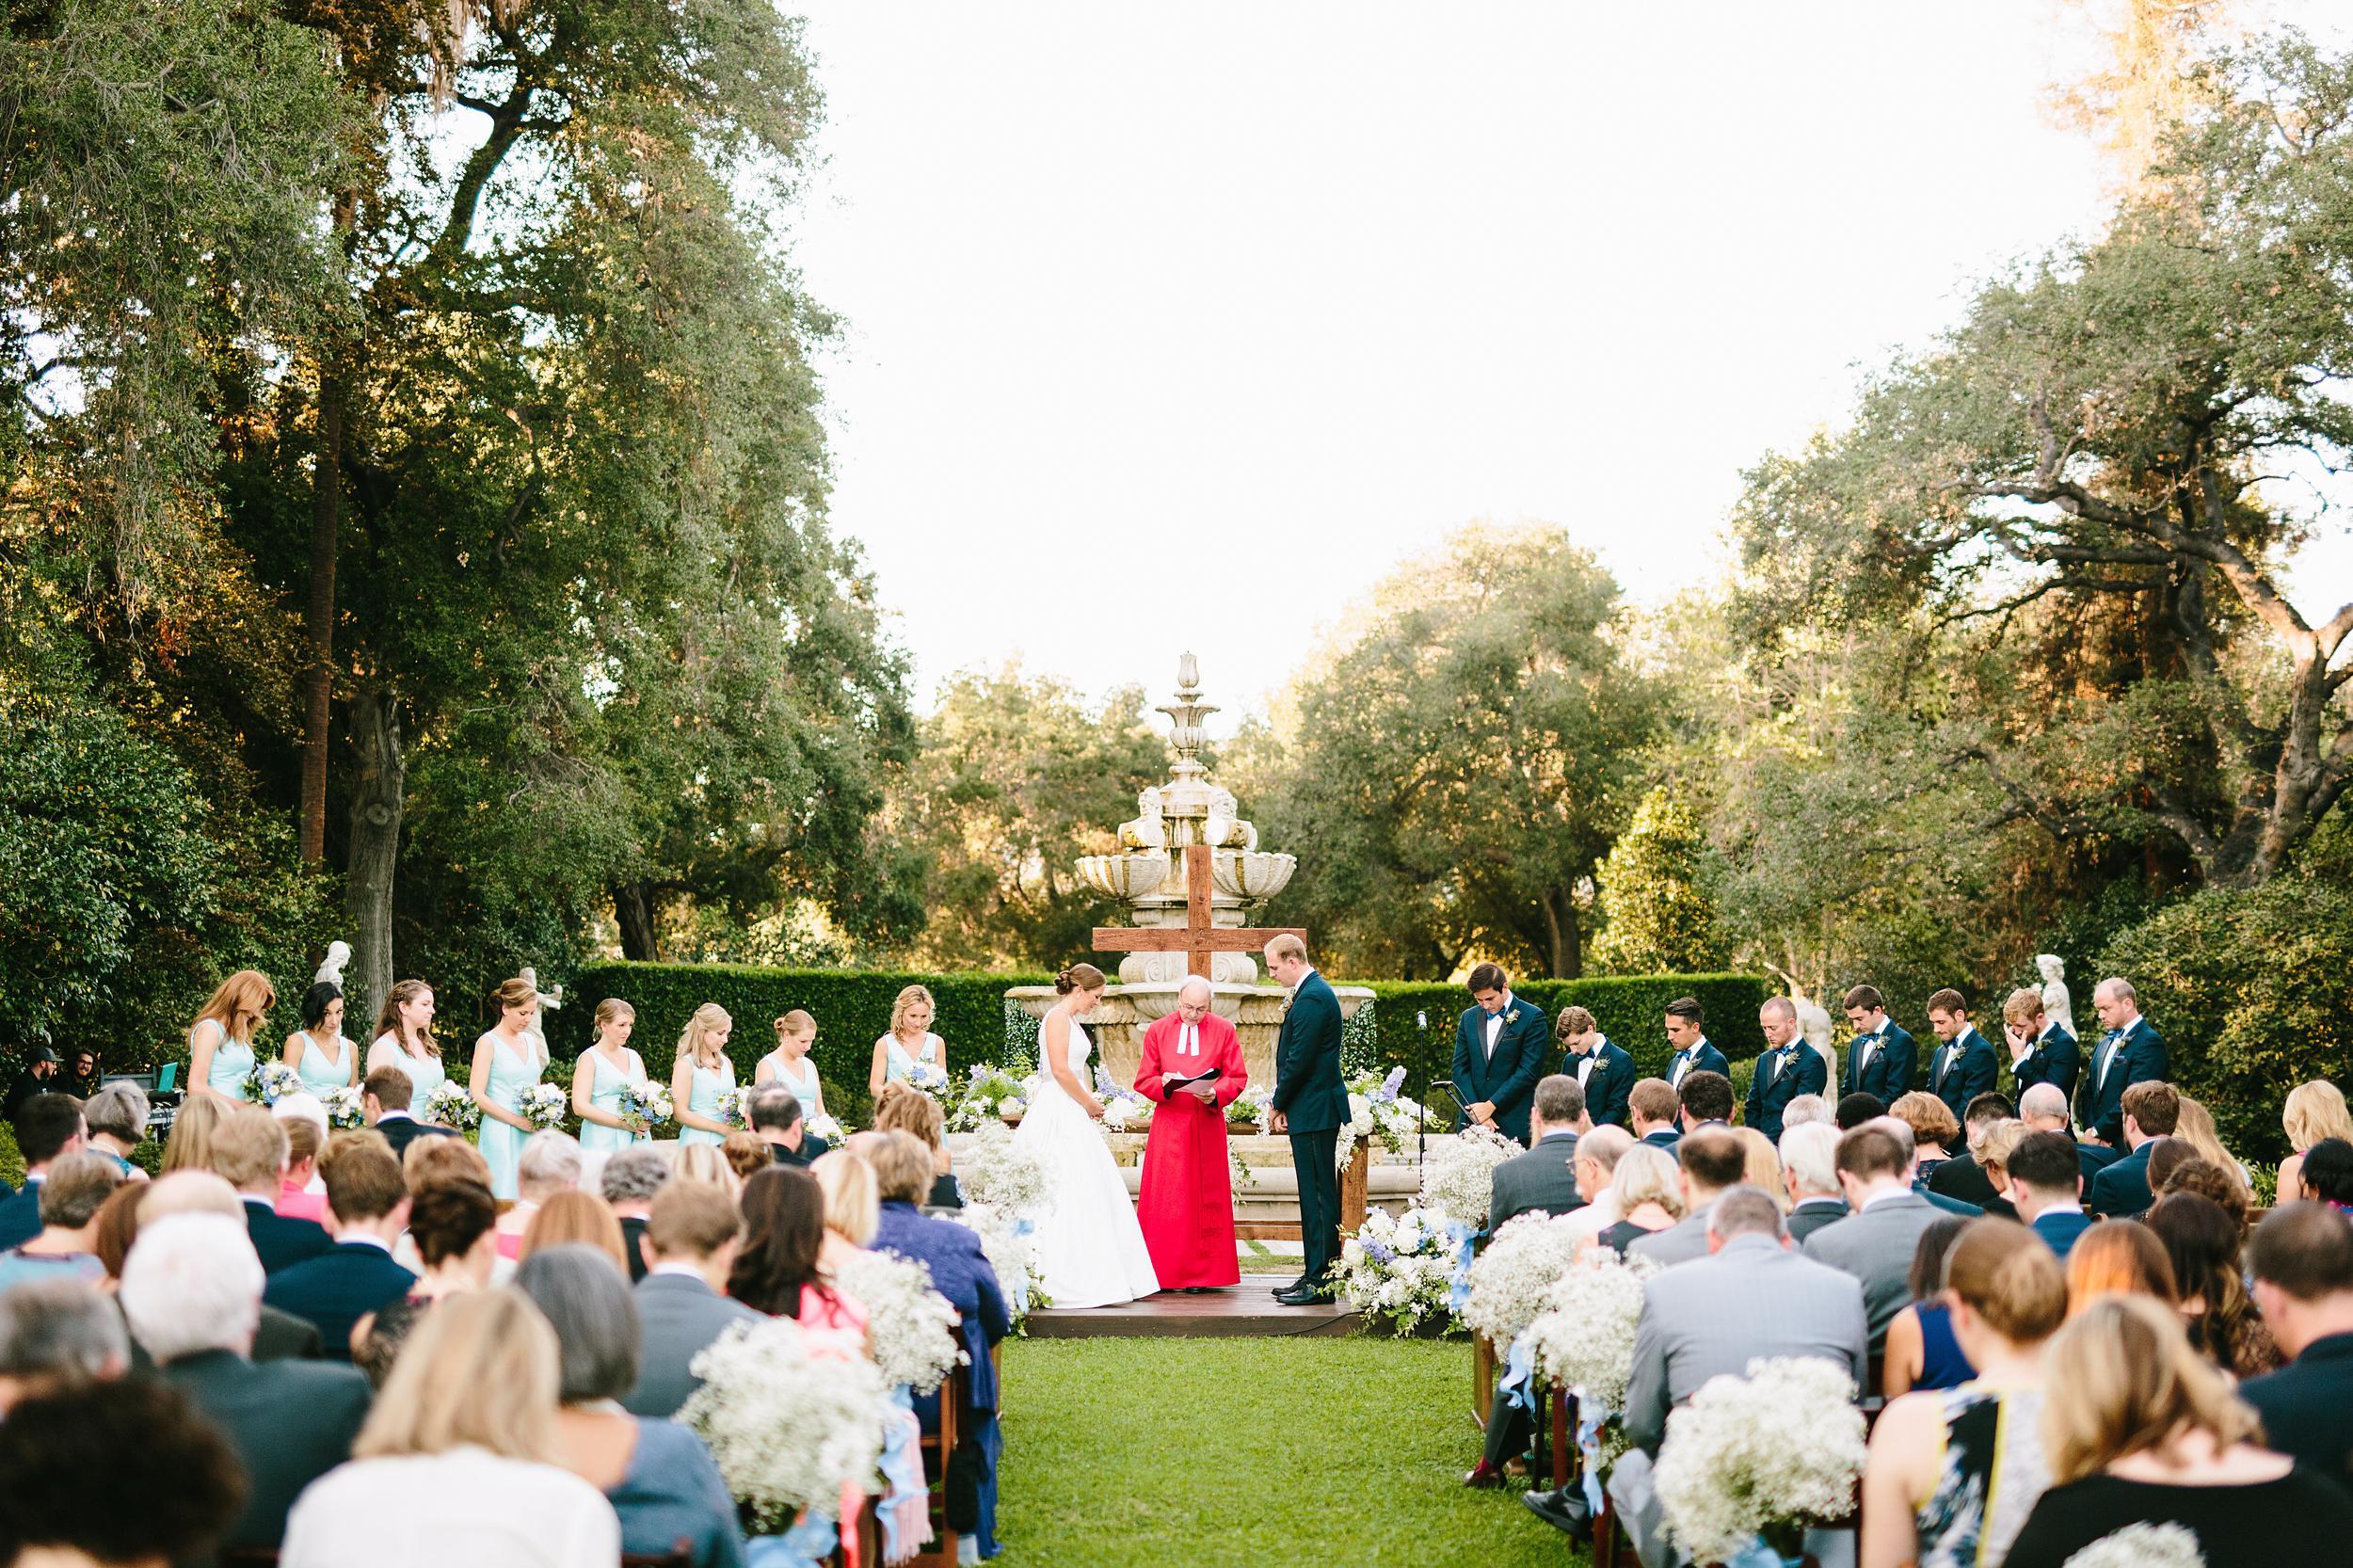 huntington-library-wedding-HP-16.jpg